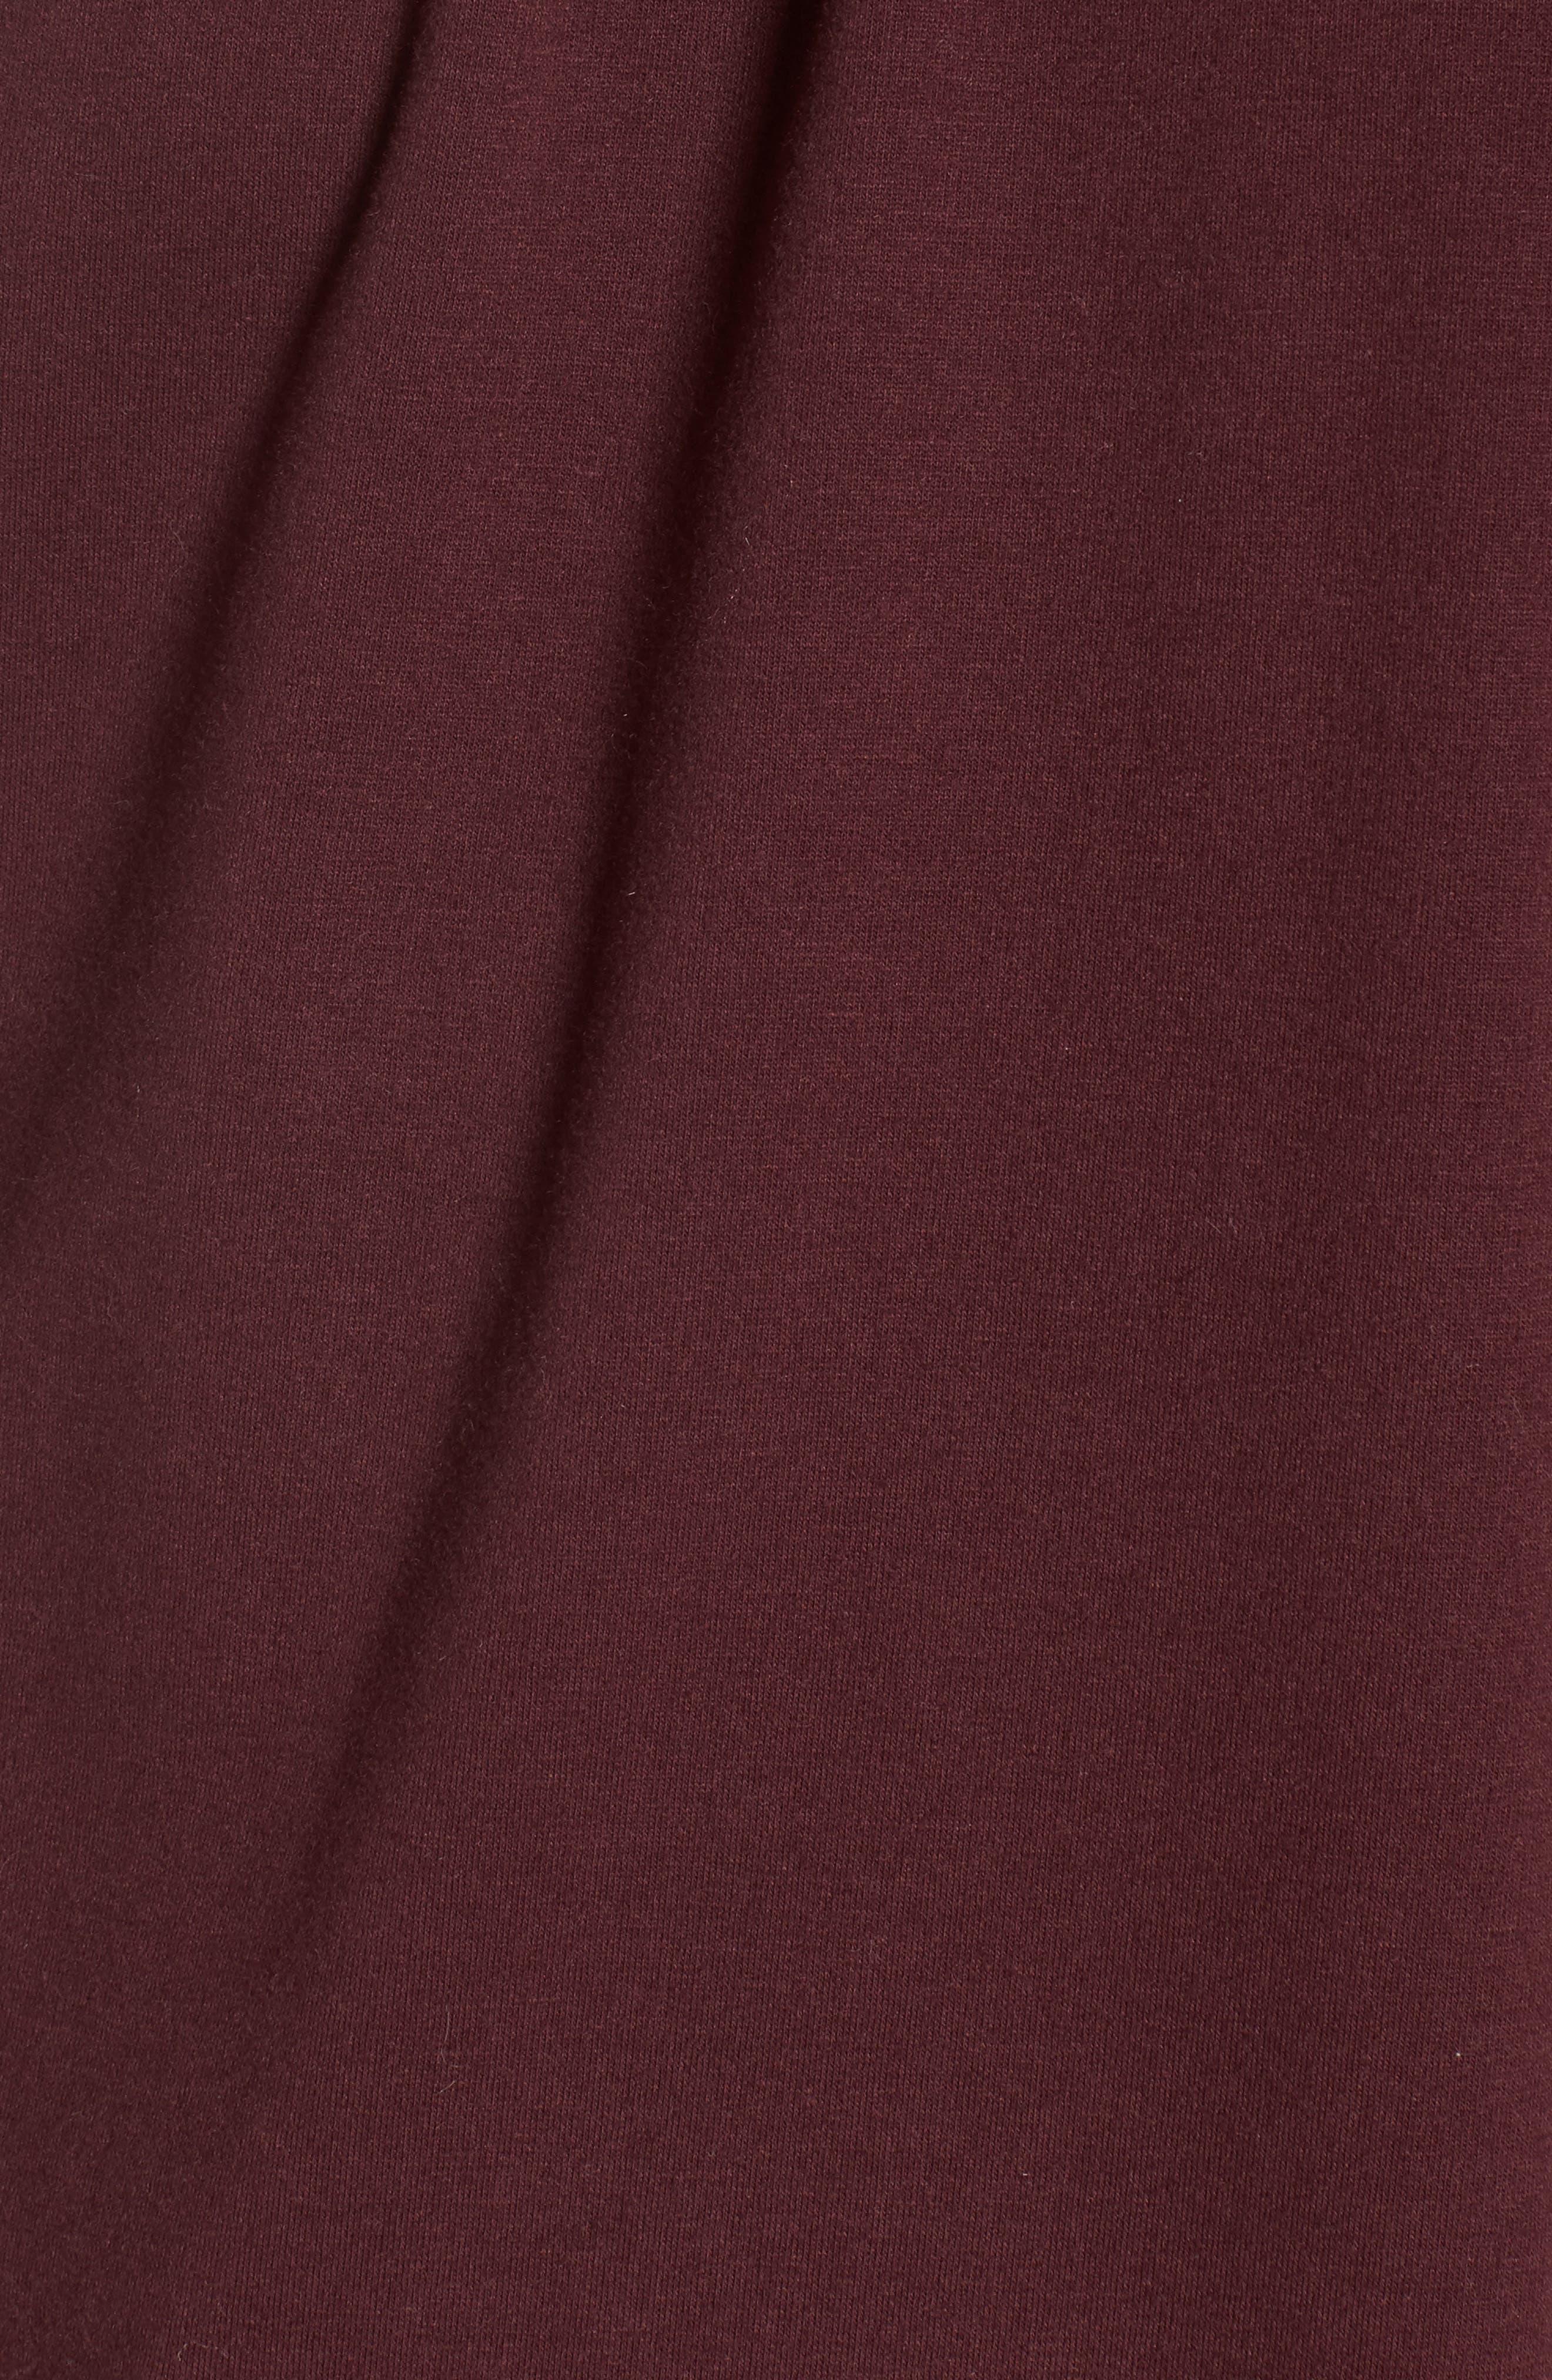 Pleated Knit Top,                             Alternate thumbnail 5, color,                             Burgundy Stem